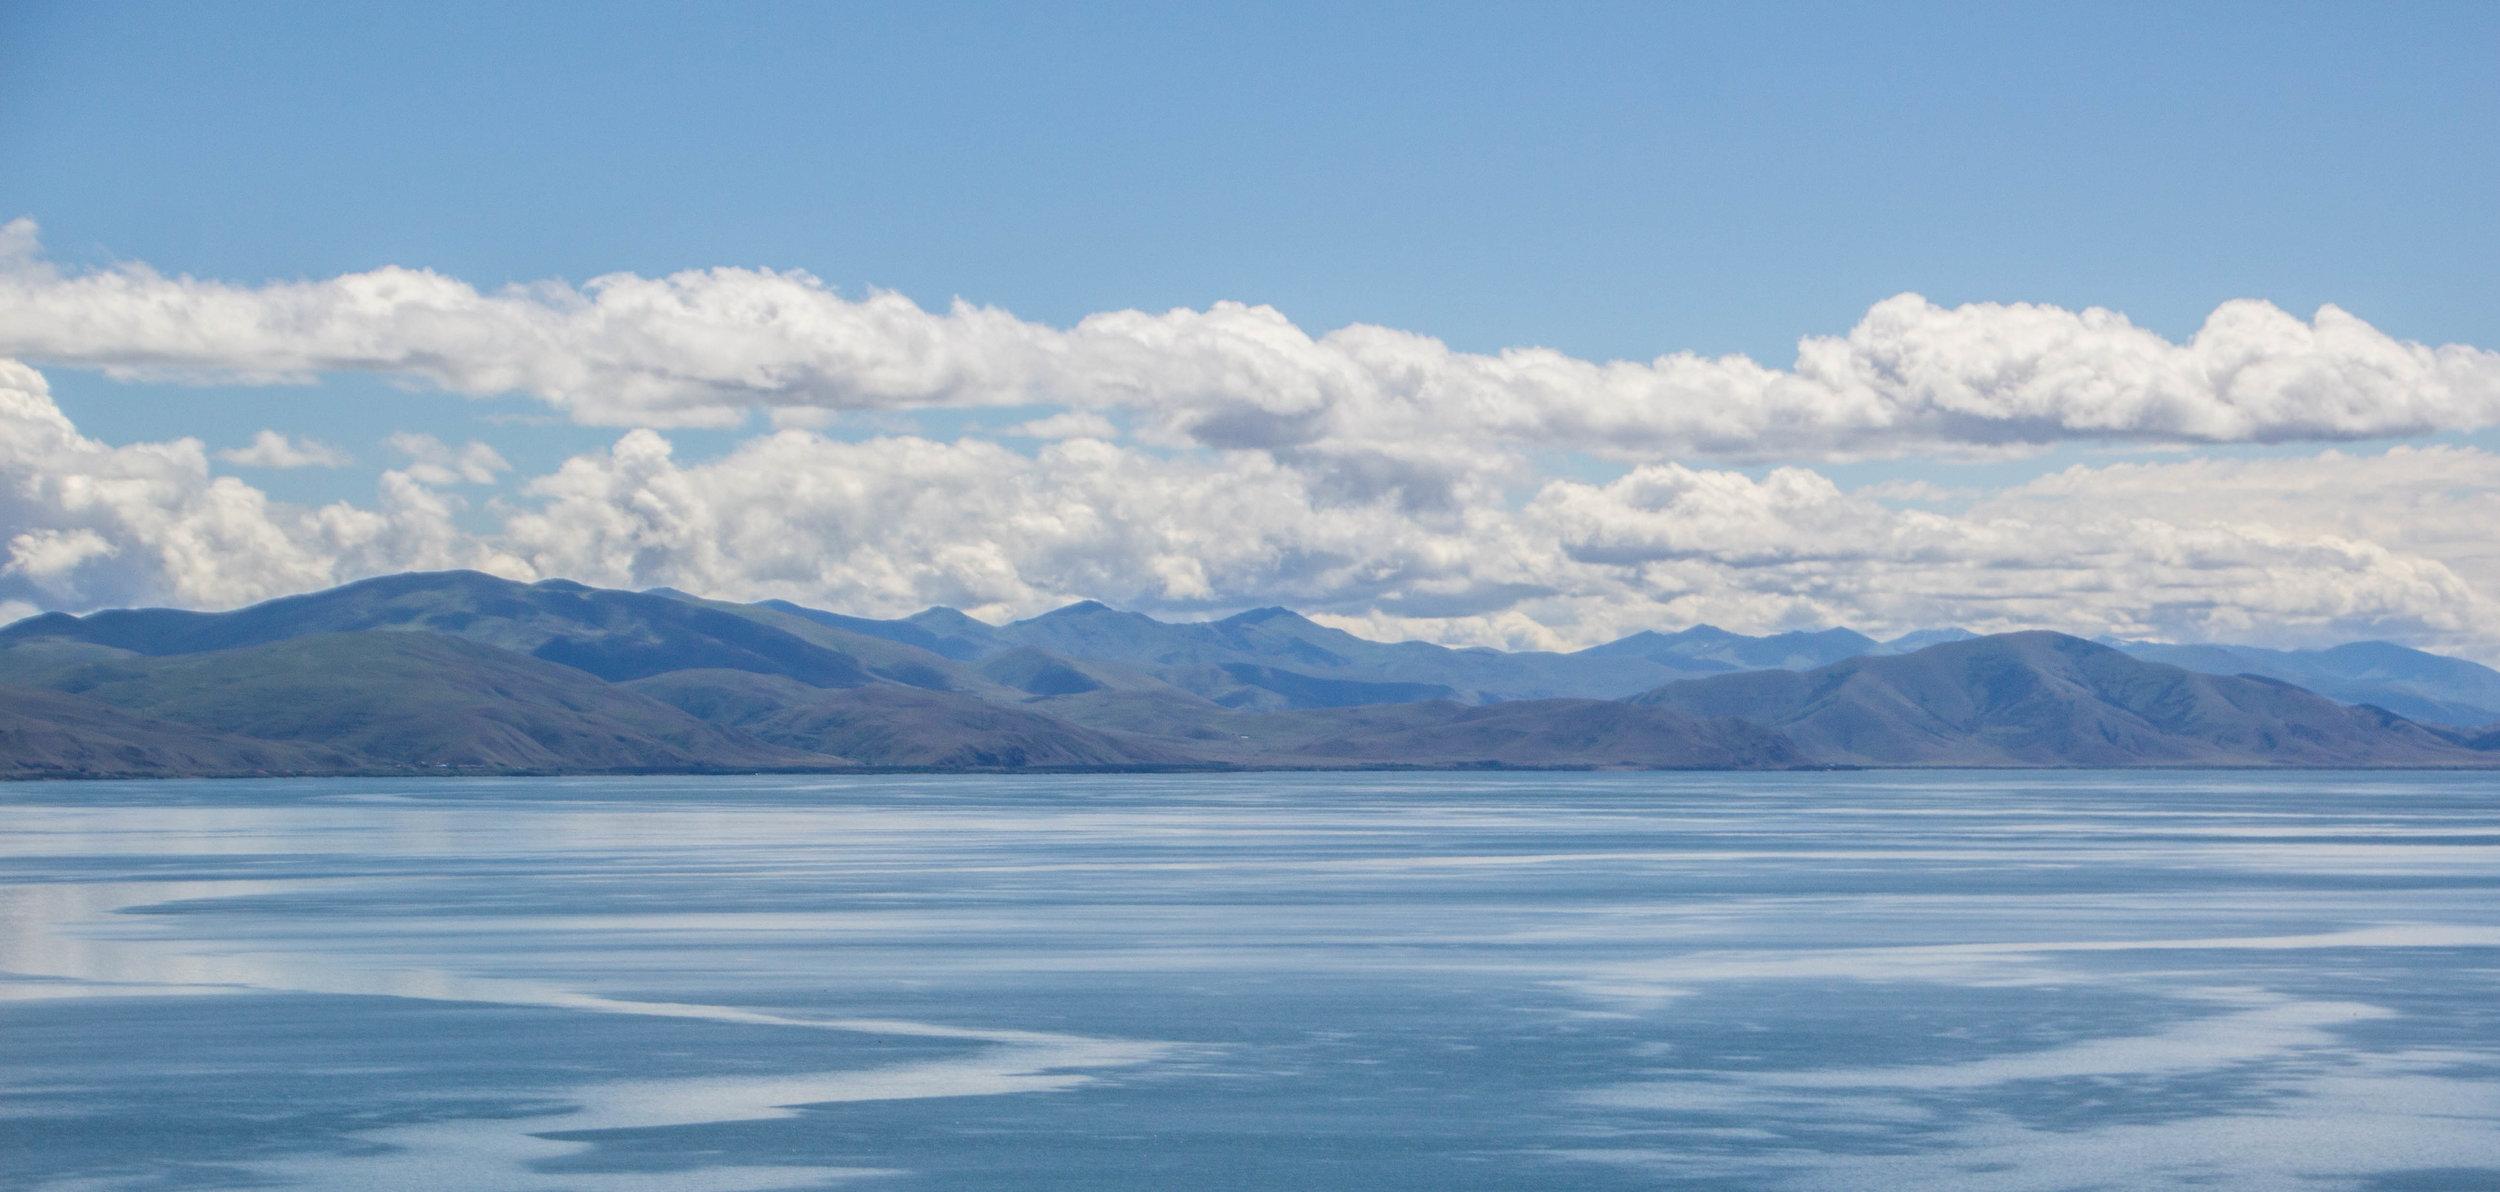 sevanavank-lake-sevan-armenia-22.jpg